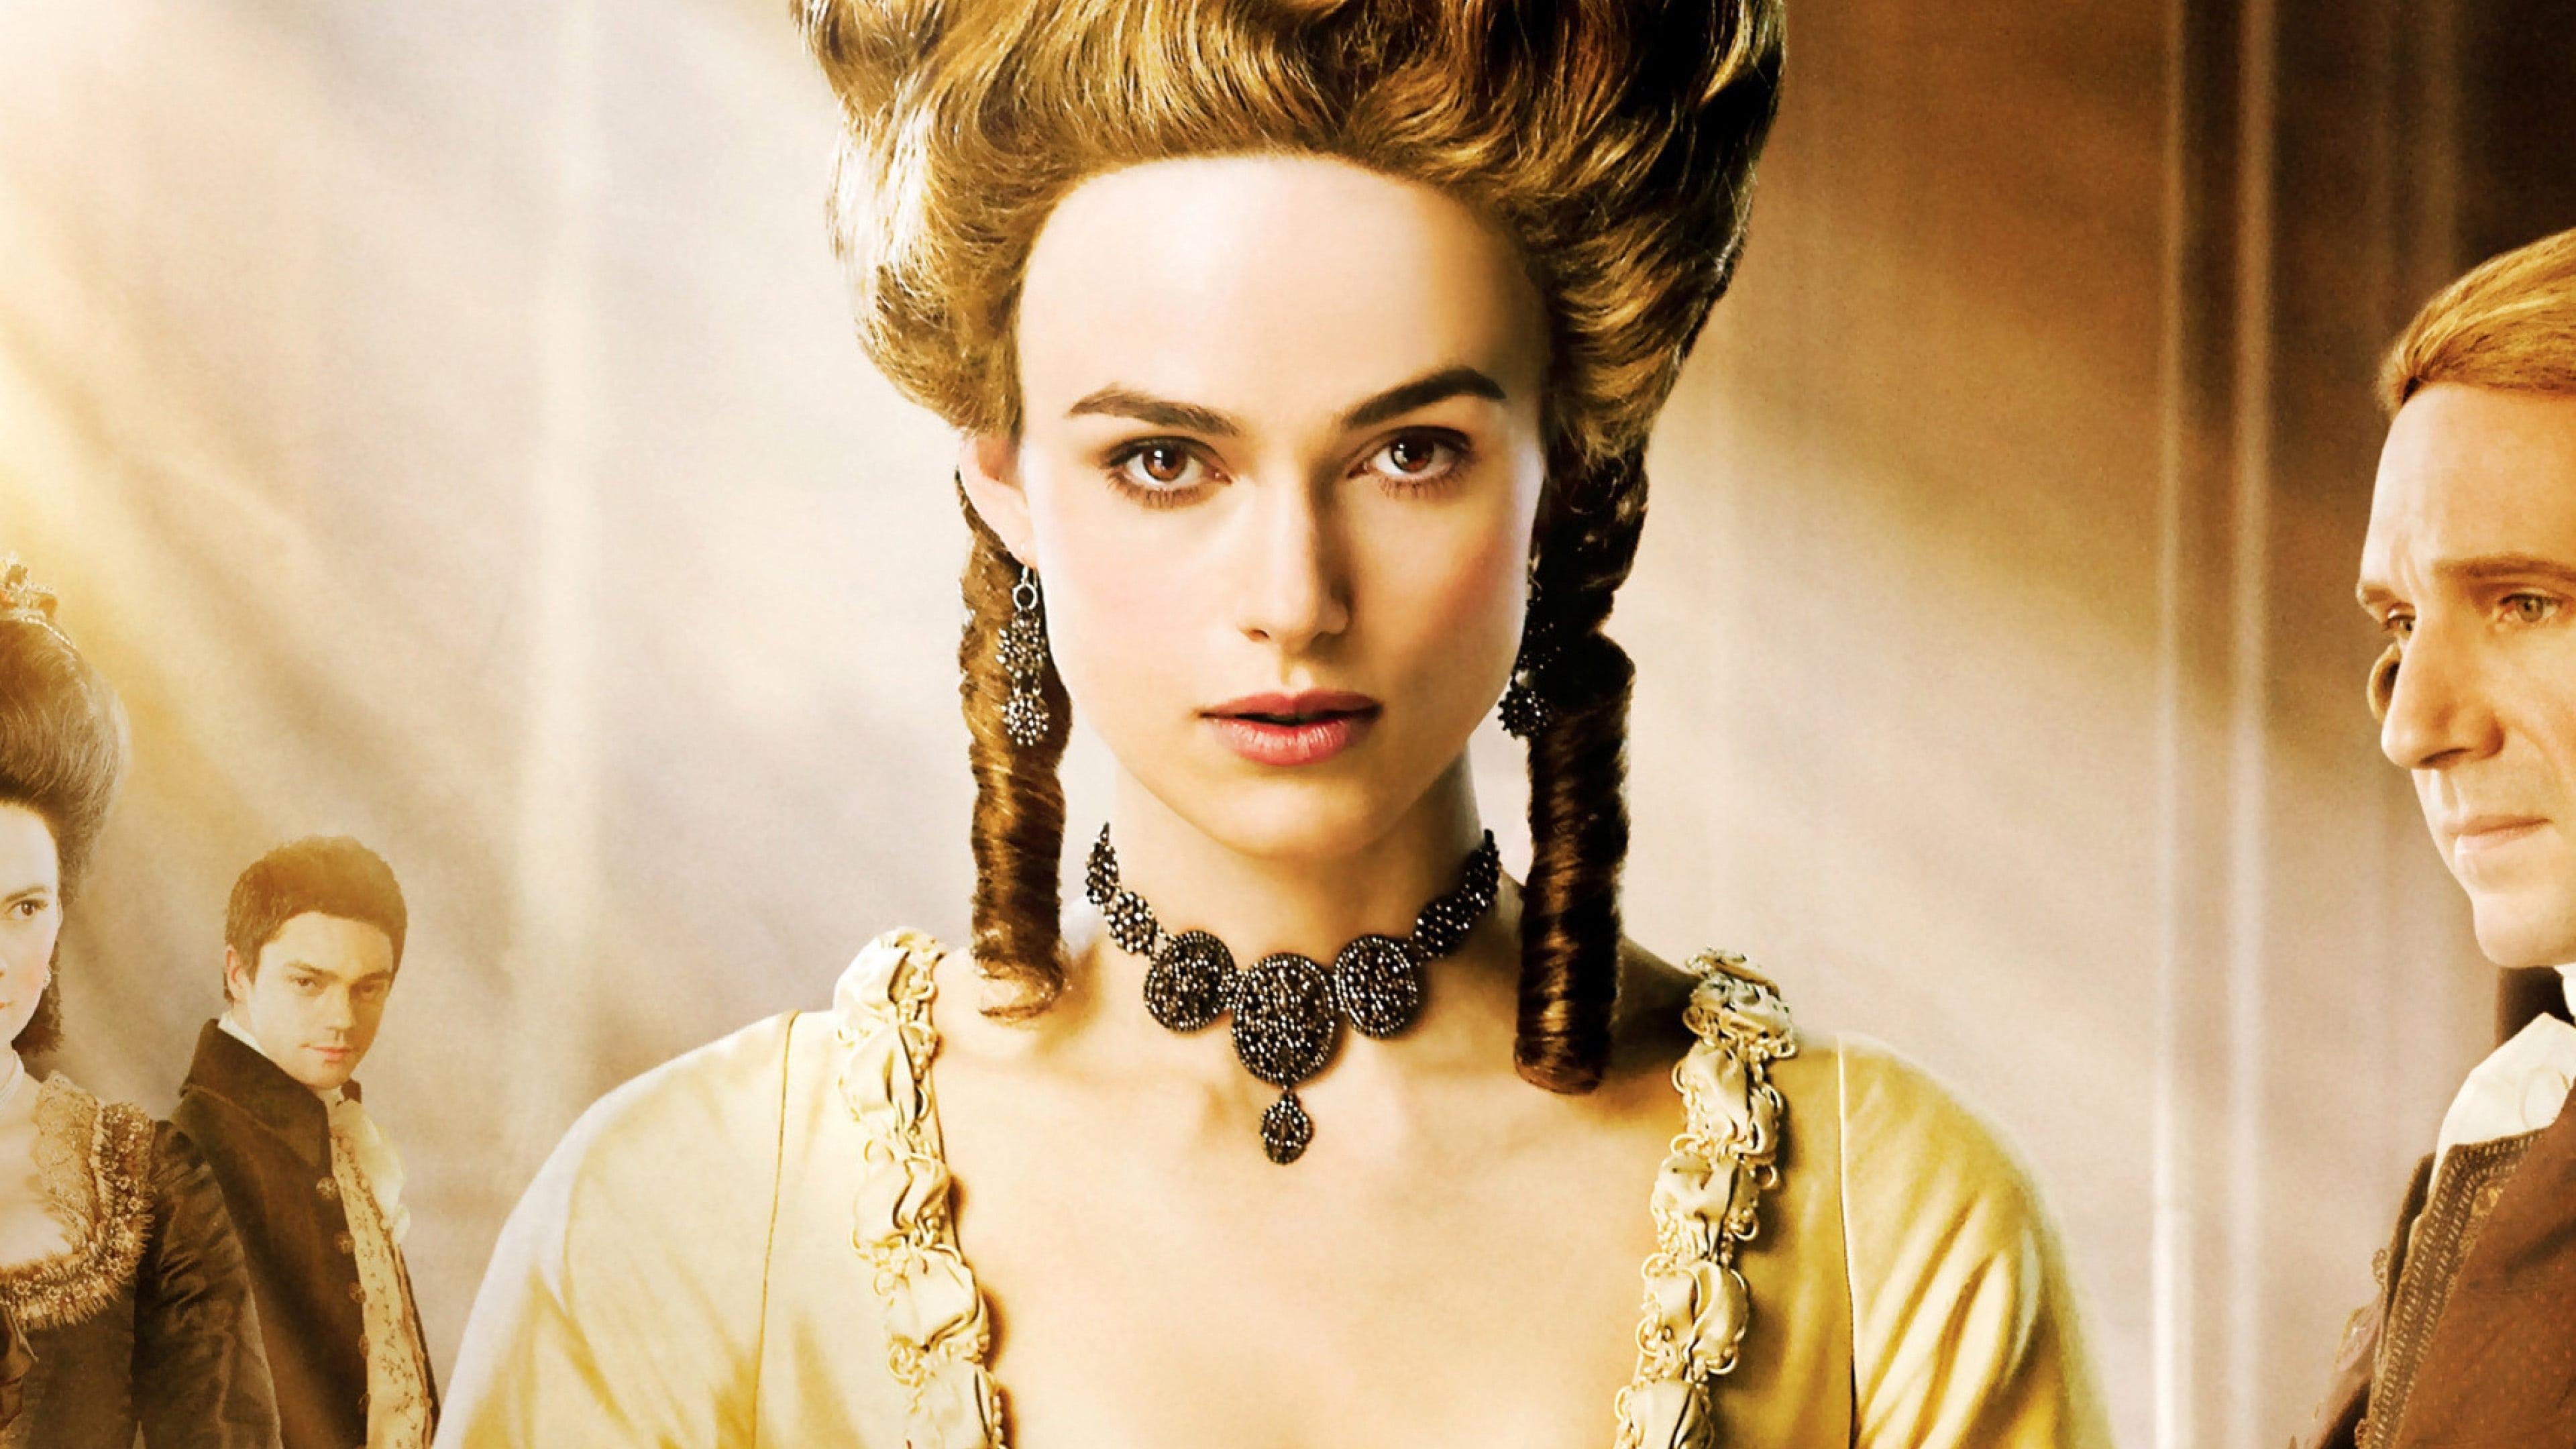 The Duchess